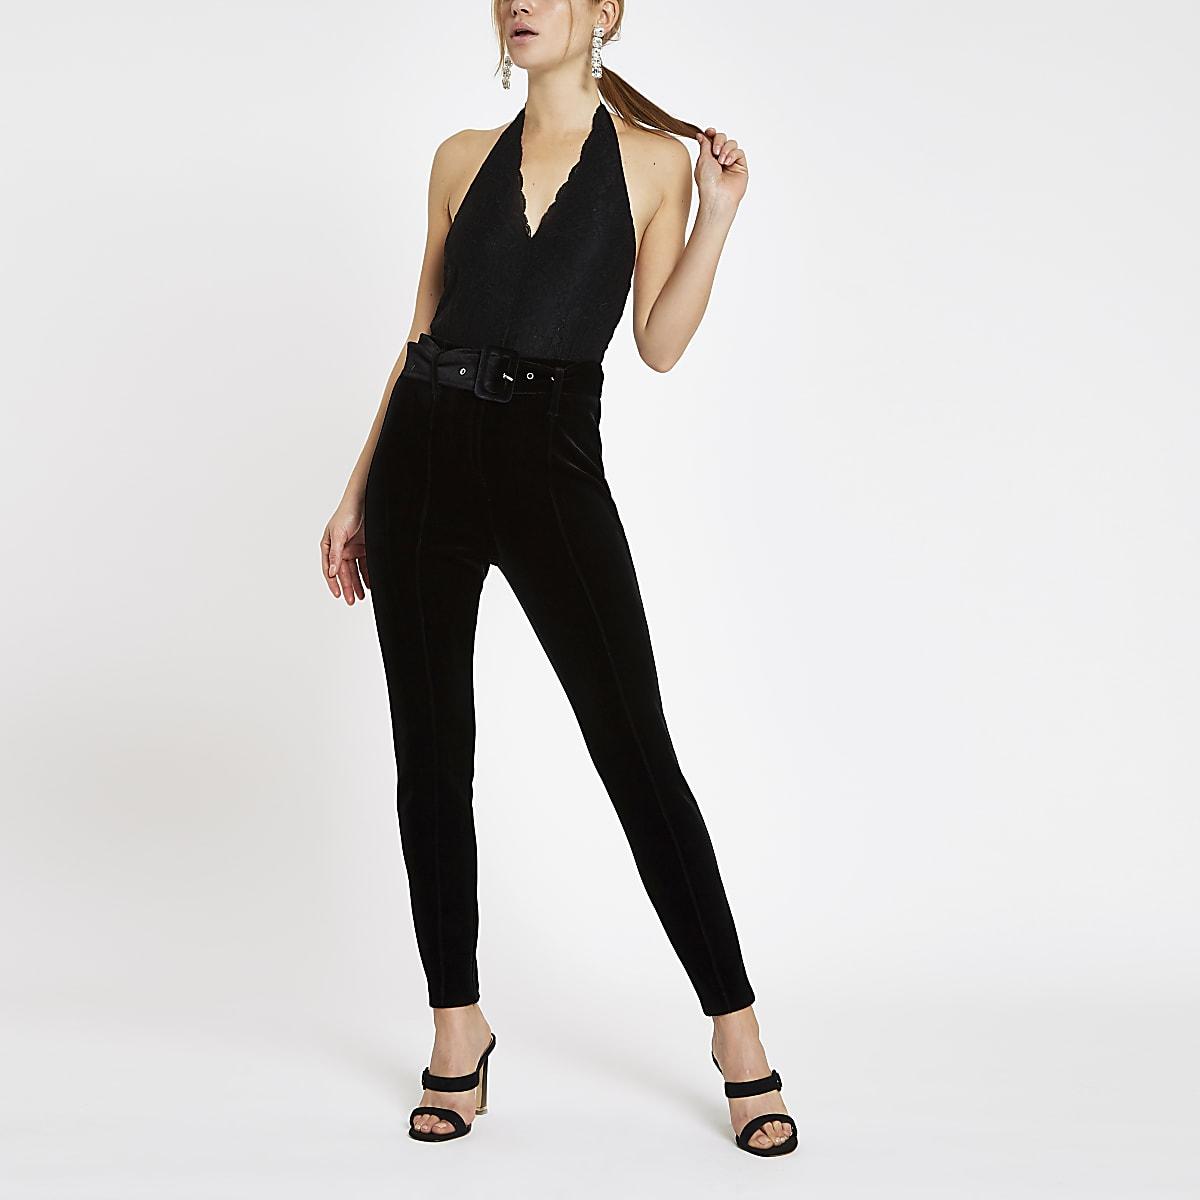 Black lace halter neck bodysuit